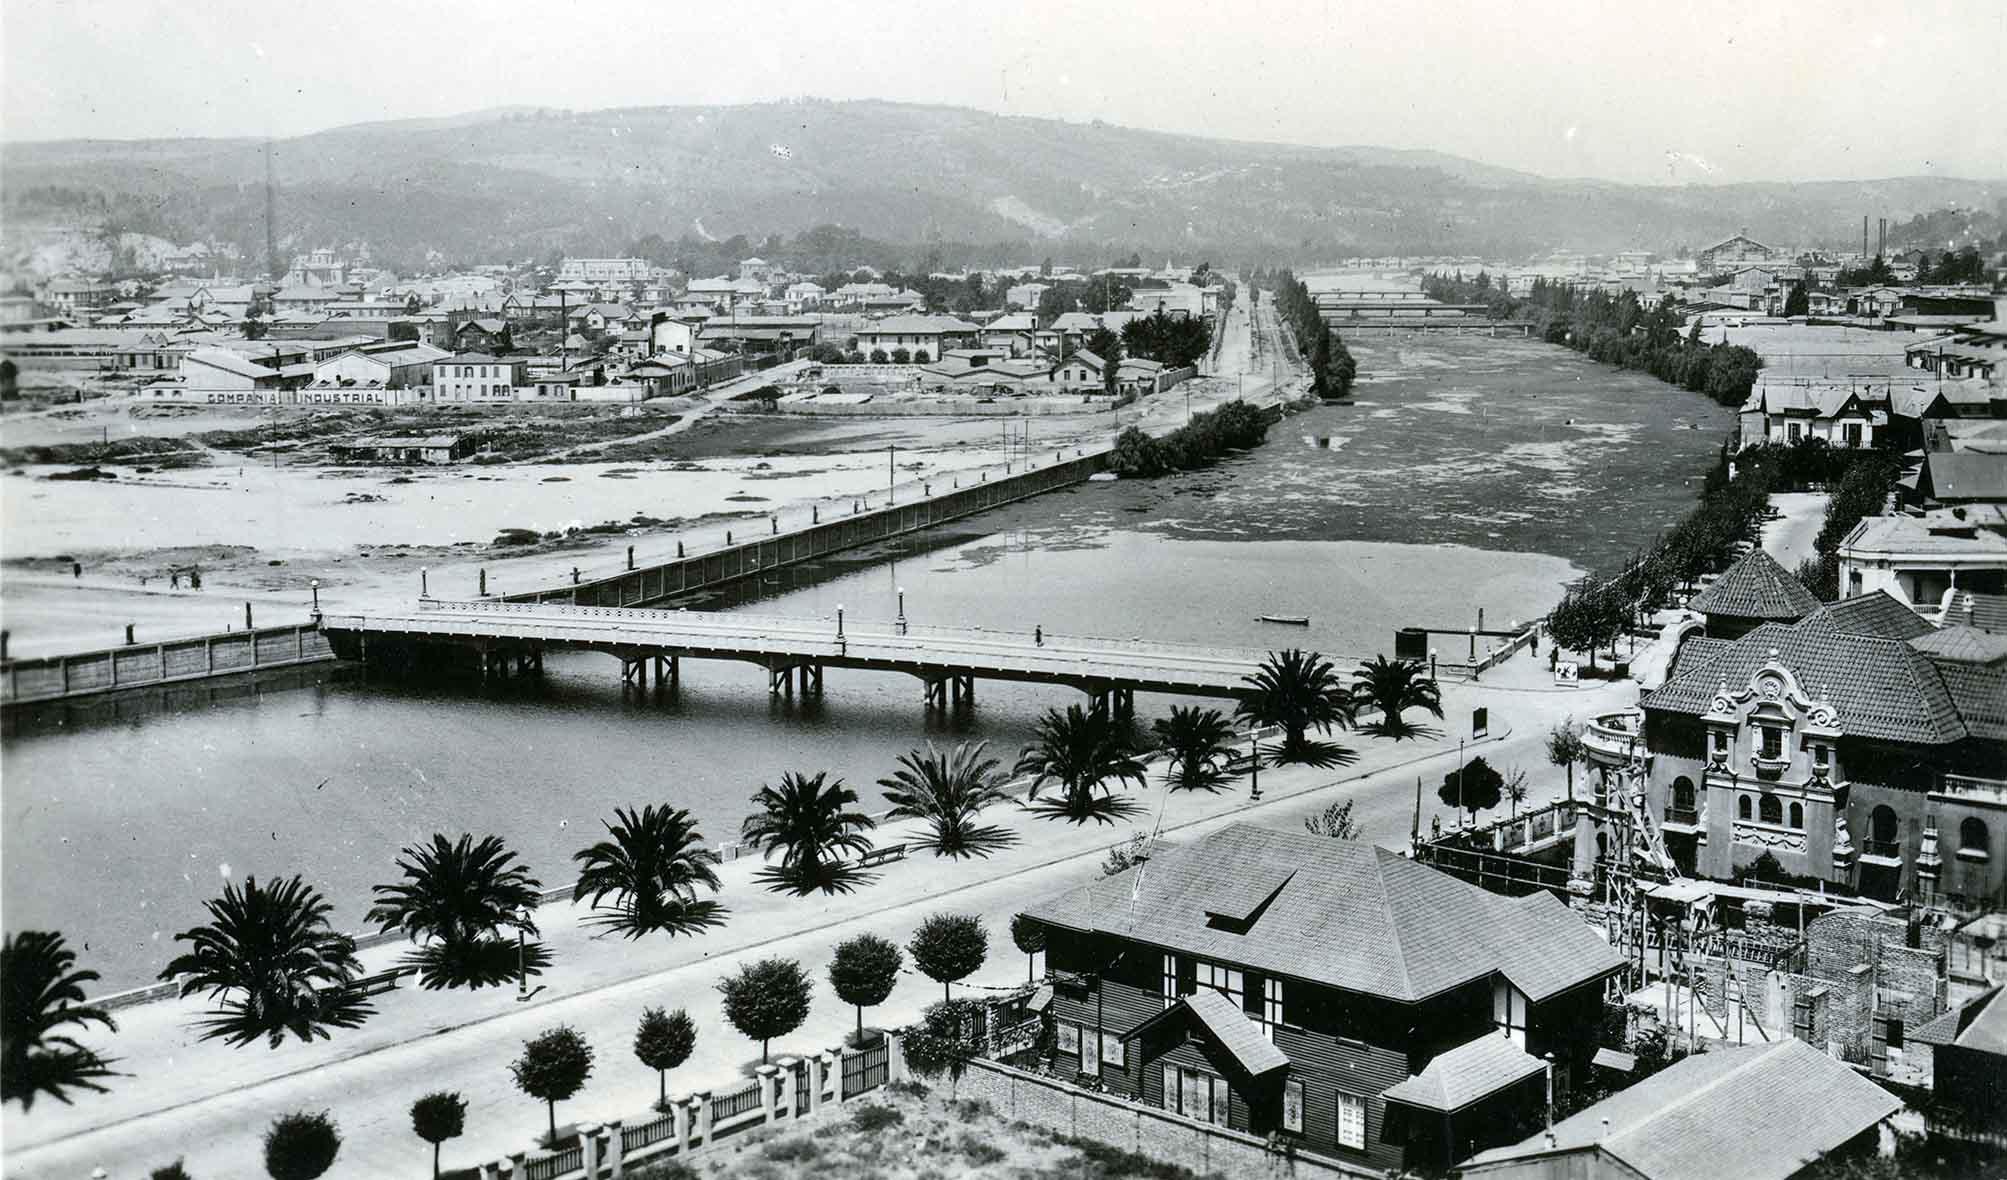 Enterreno - Fotos históricas de chile - fotos antiguas de Chile - Estero Marga Marga ca. 1920